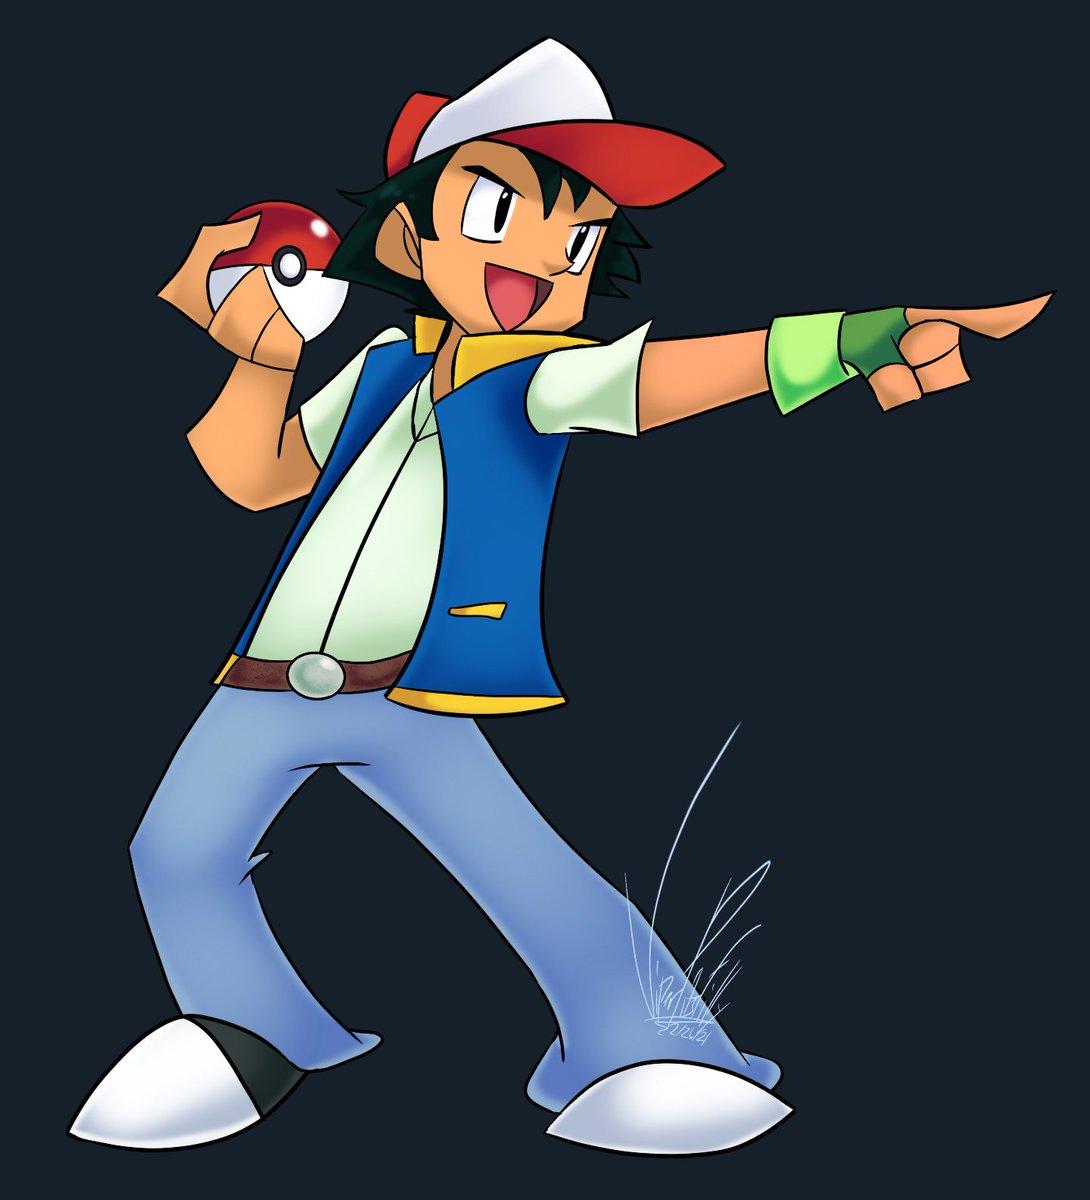 (33-36/81)  #SmashBrosUltimate  #WarnerBros #cartoonNetwork  #pokemon